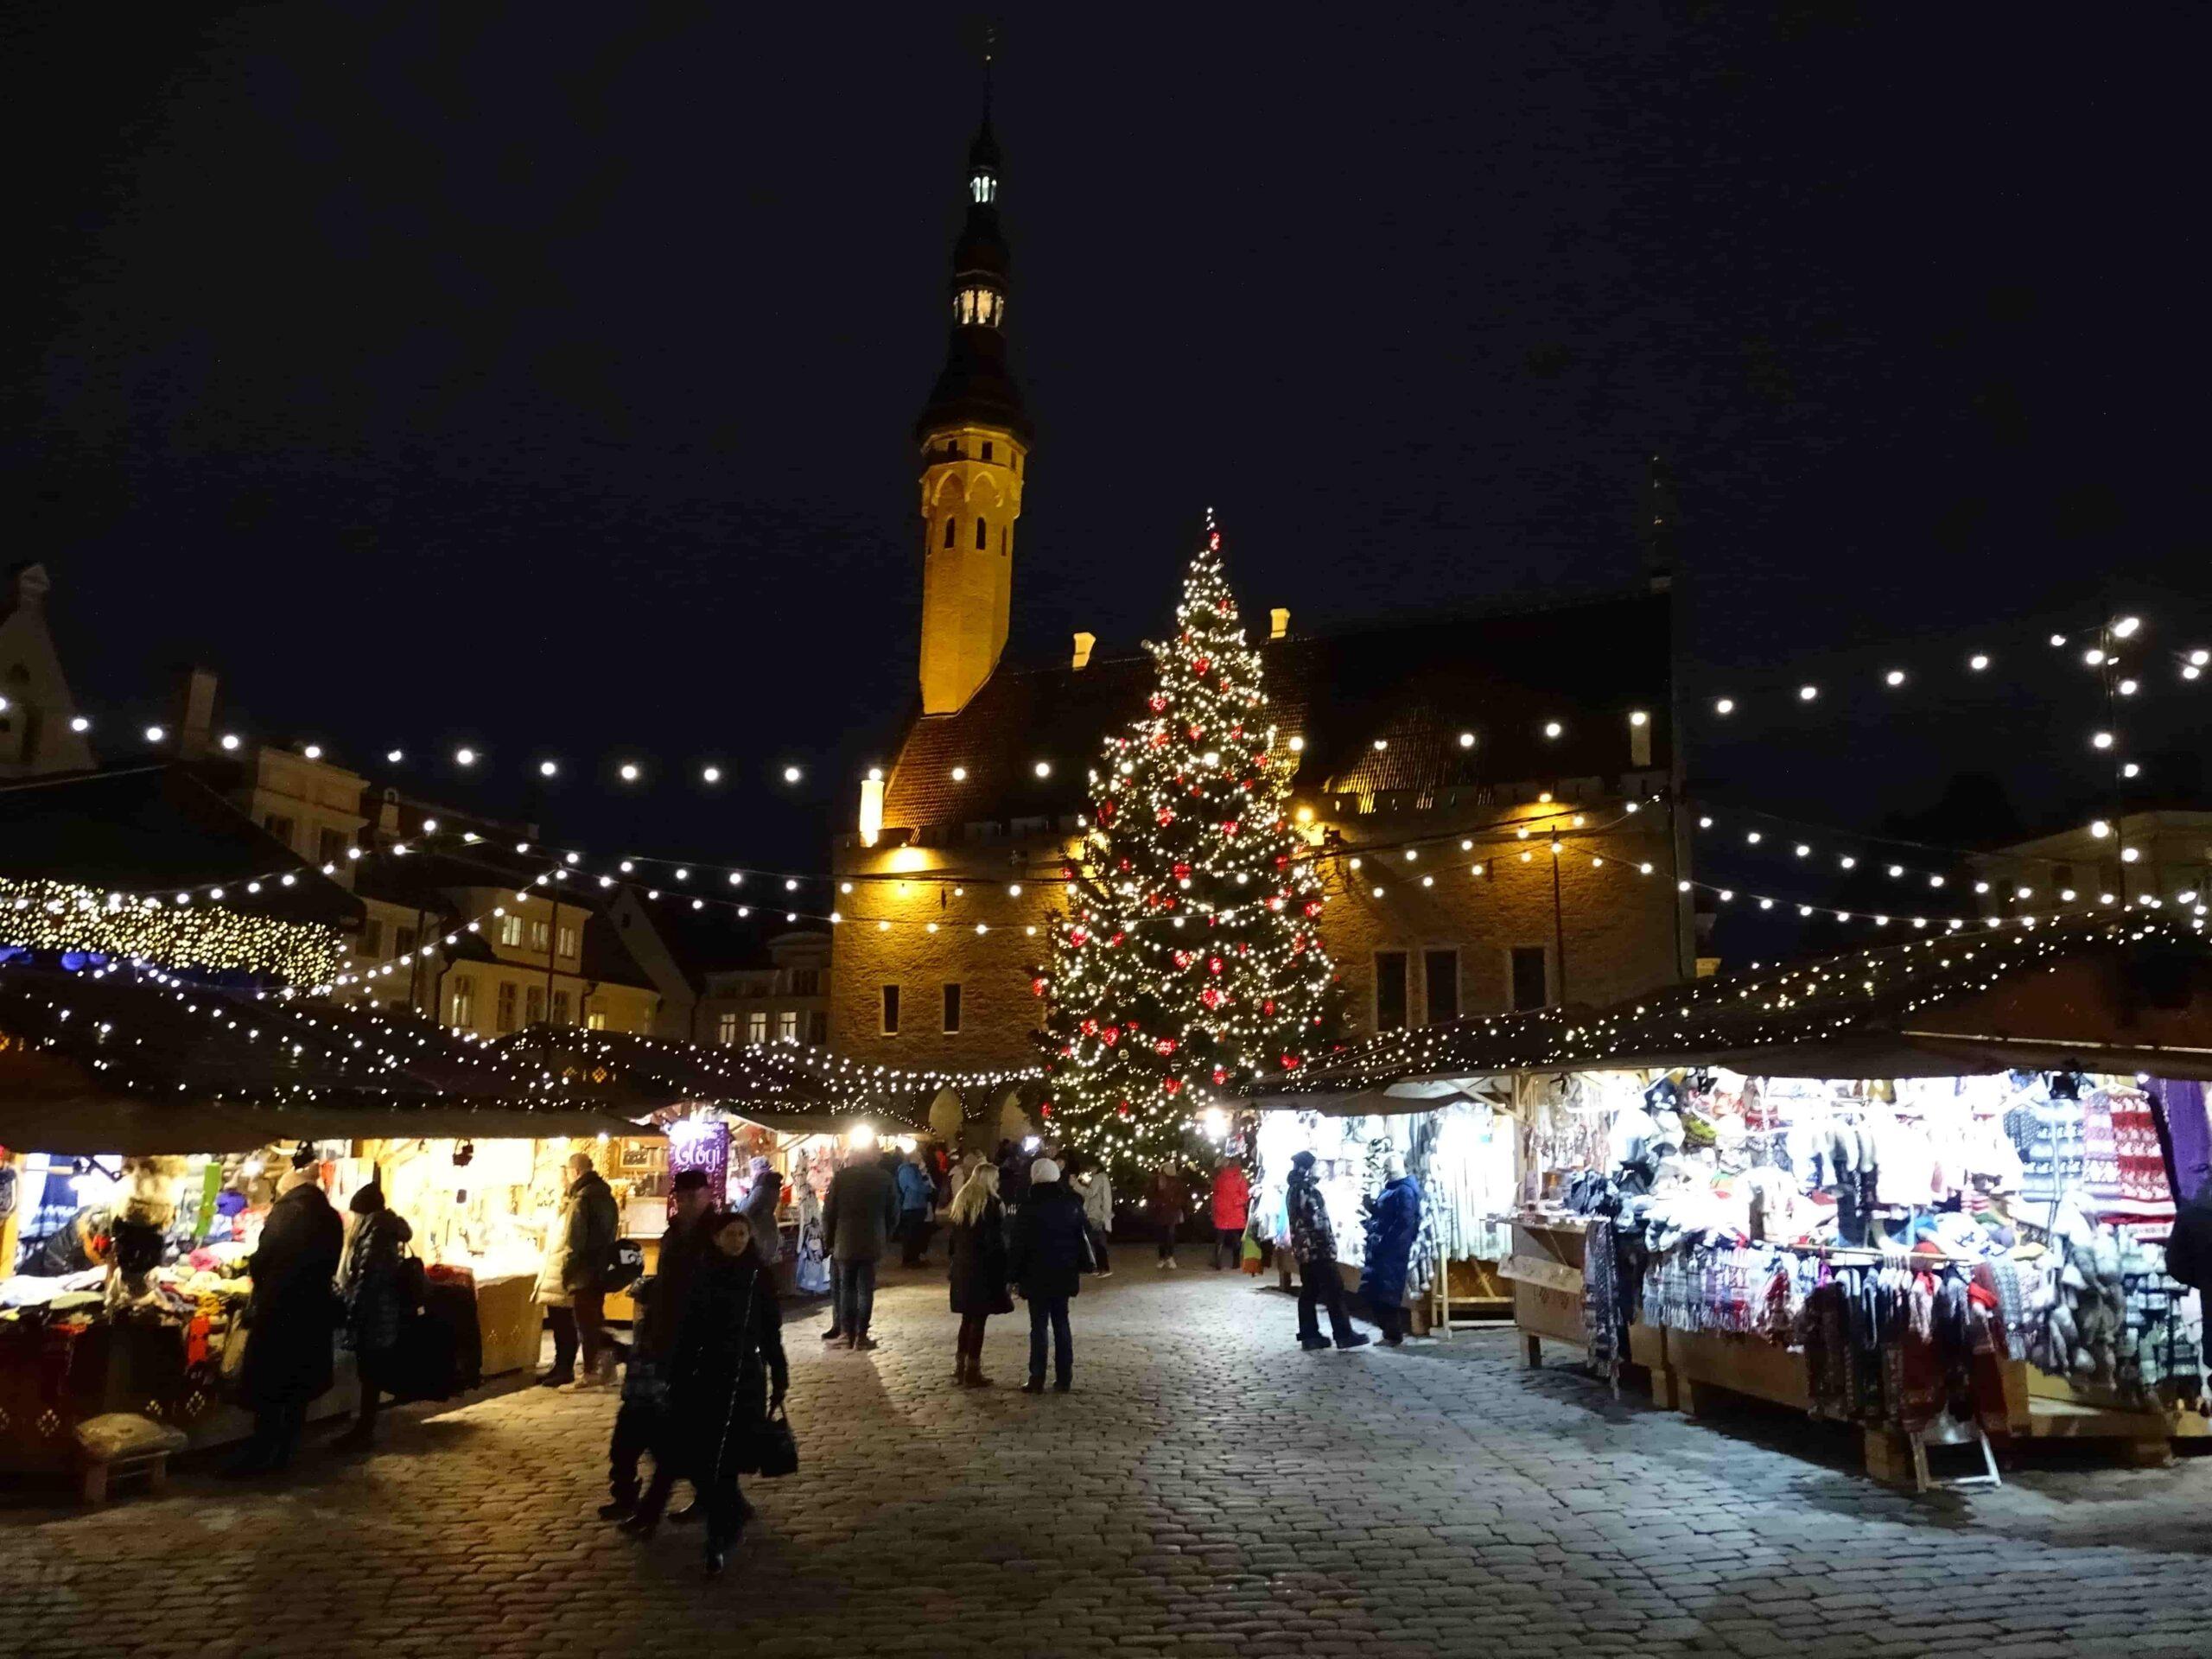 Jõulud vanas Tallinnas – Kiek in de Kök, Niguliste kirik, raekoda, jõuluturg.